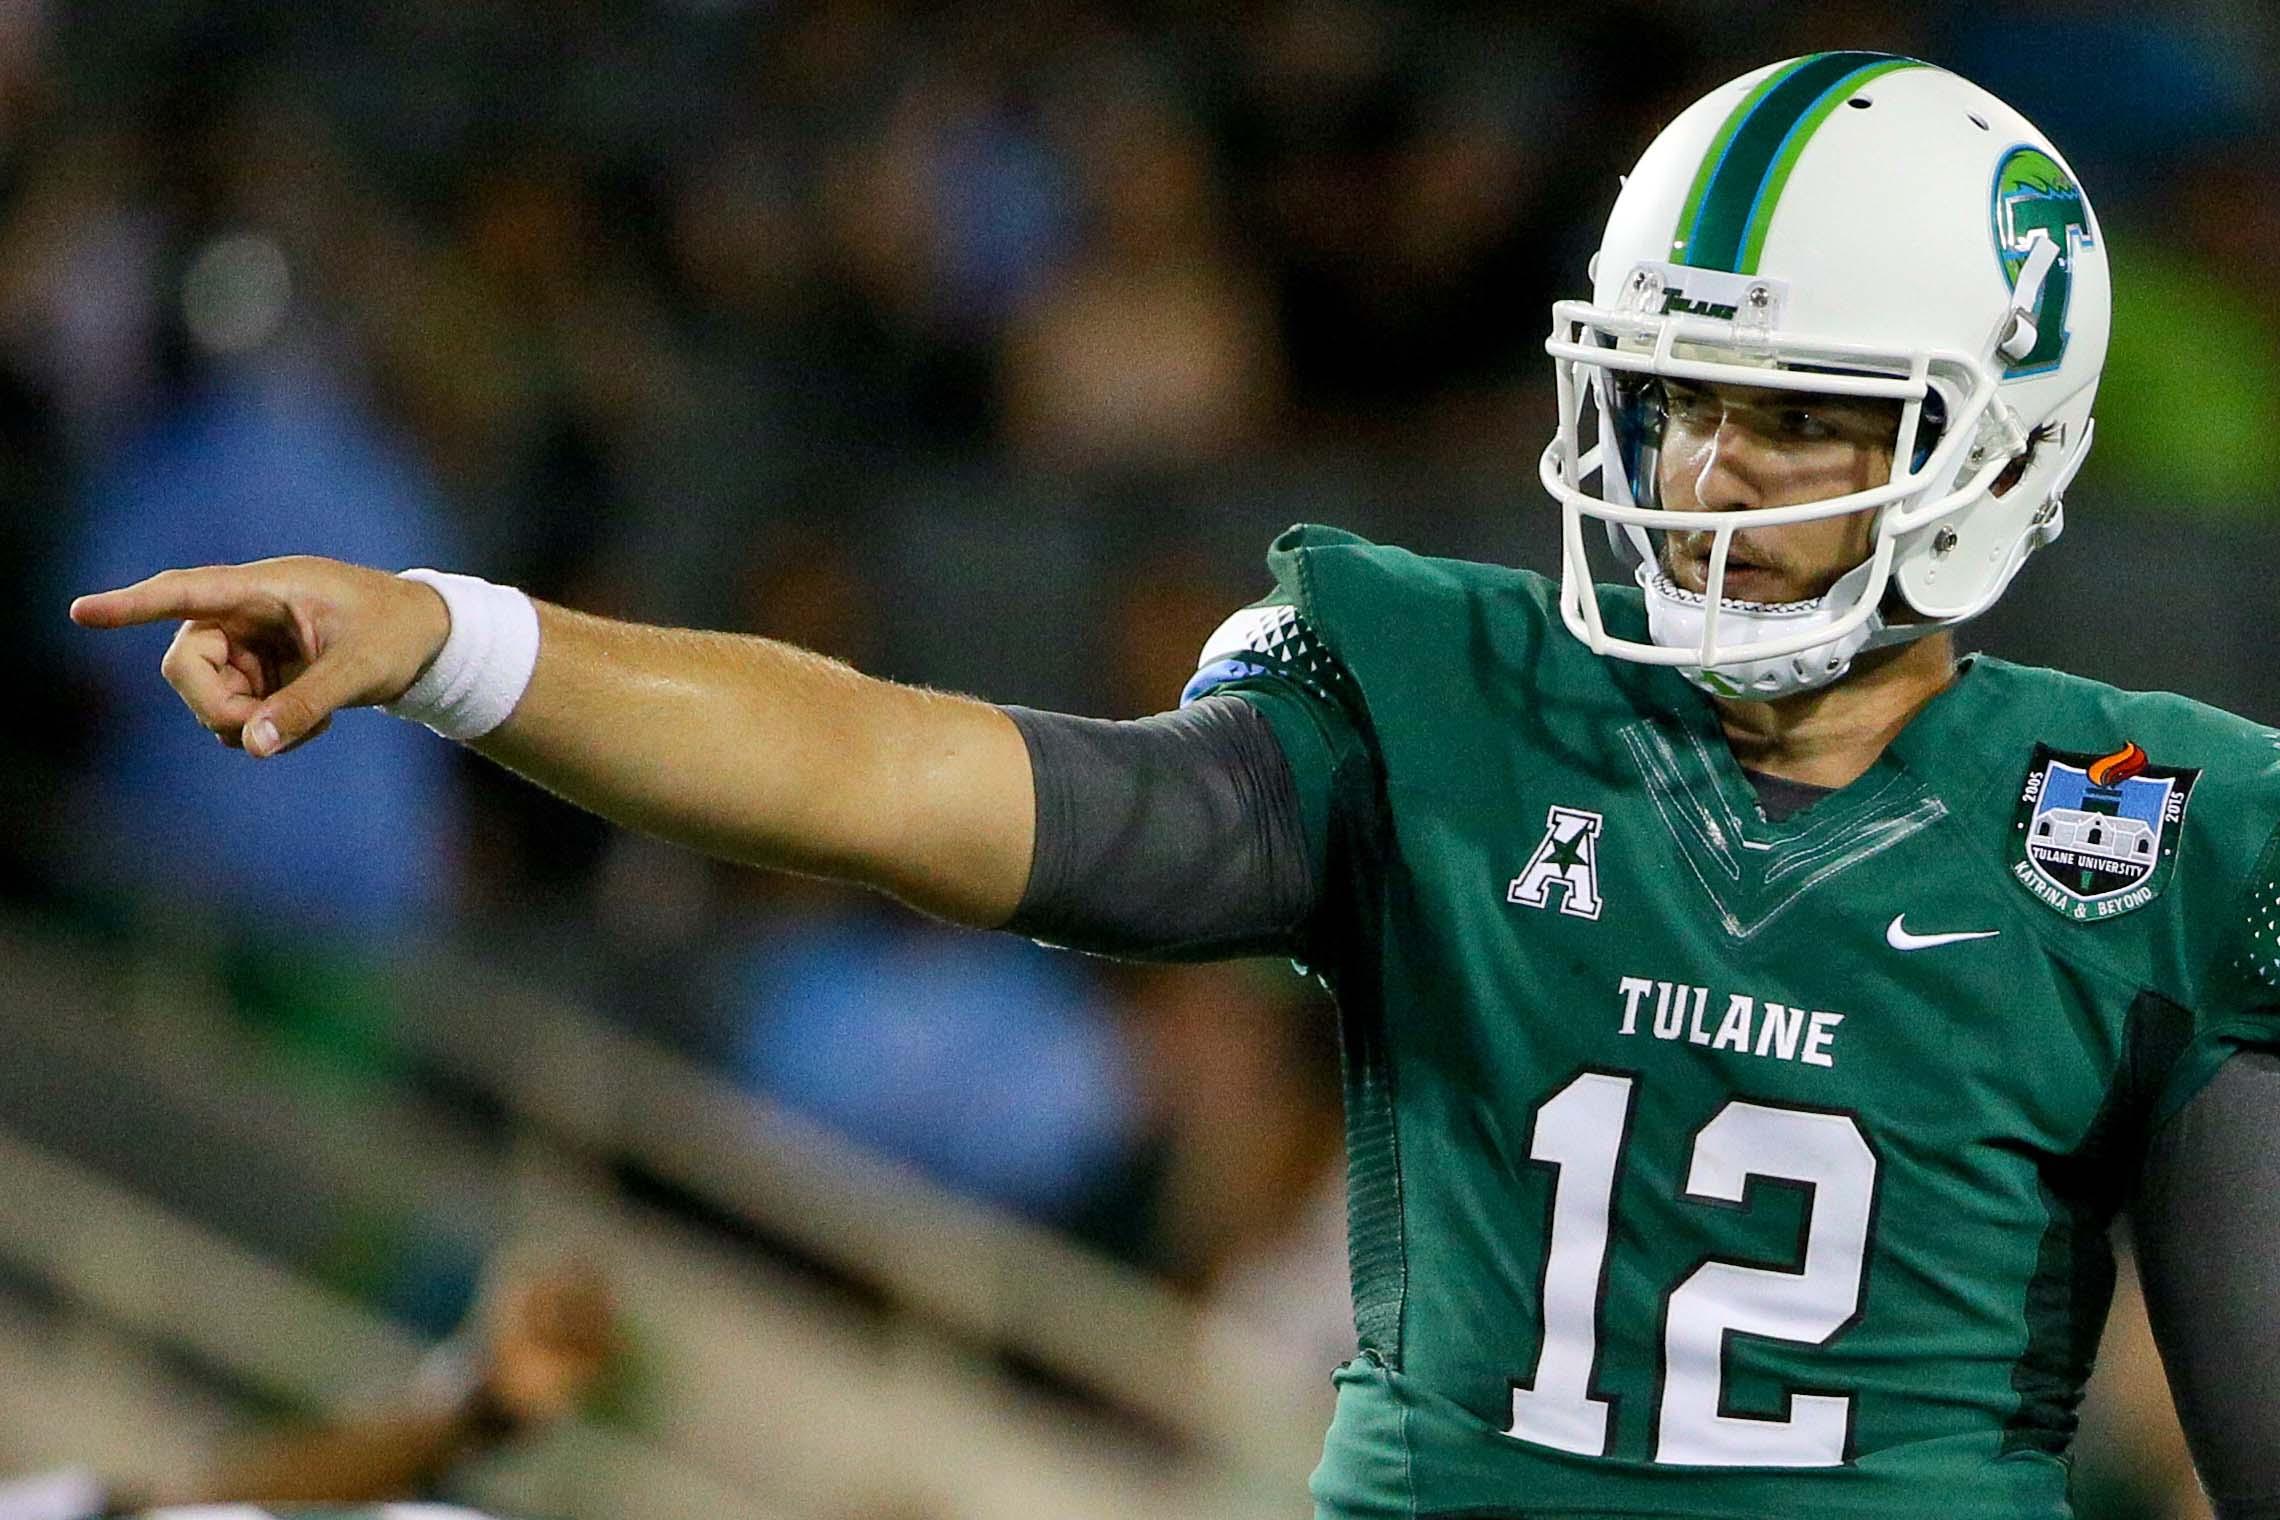 NCAA Football: Duke at Tulane